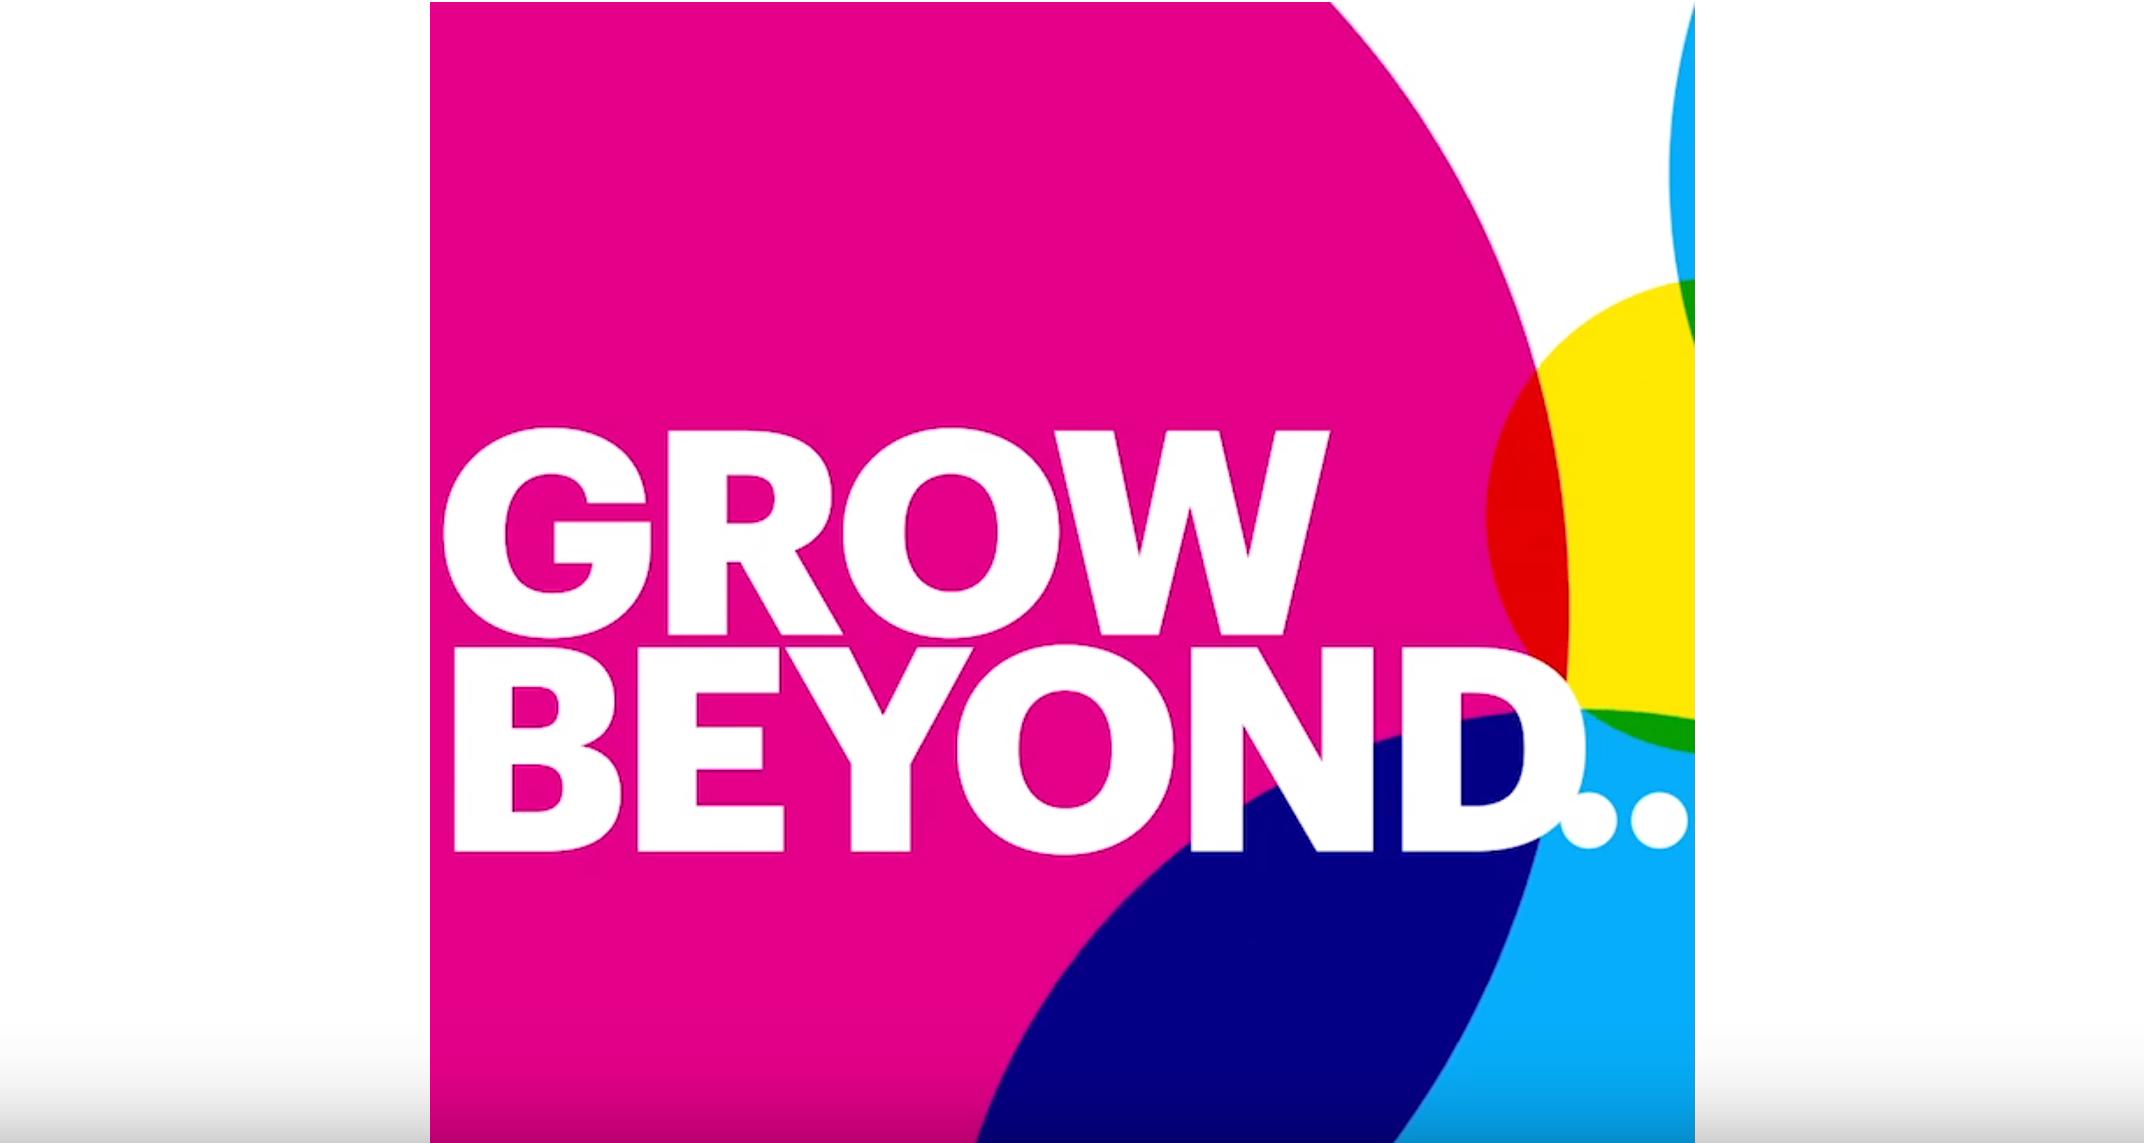 ns-grow-beyond-suiteworld19